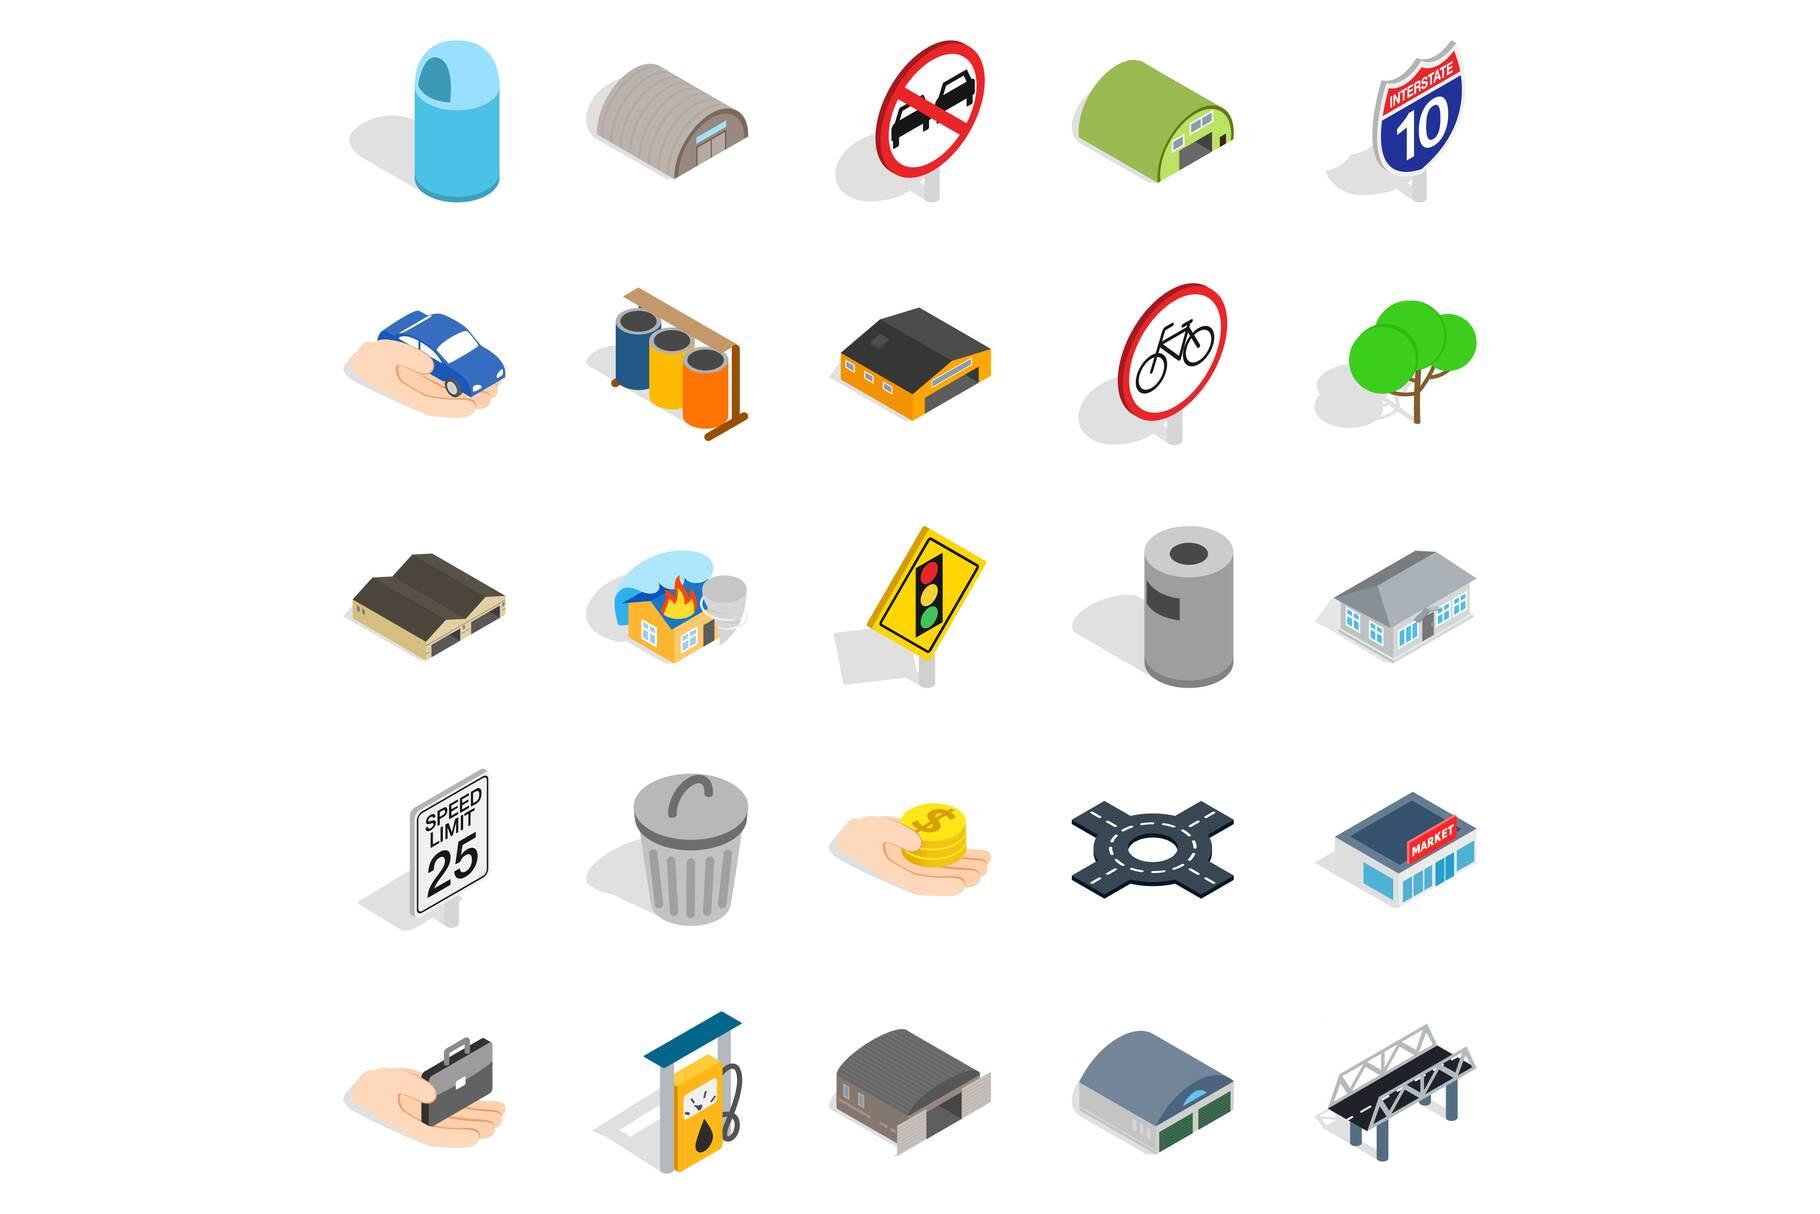 Urban buildings icons set, isometric style example image 1